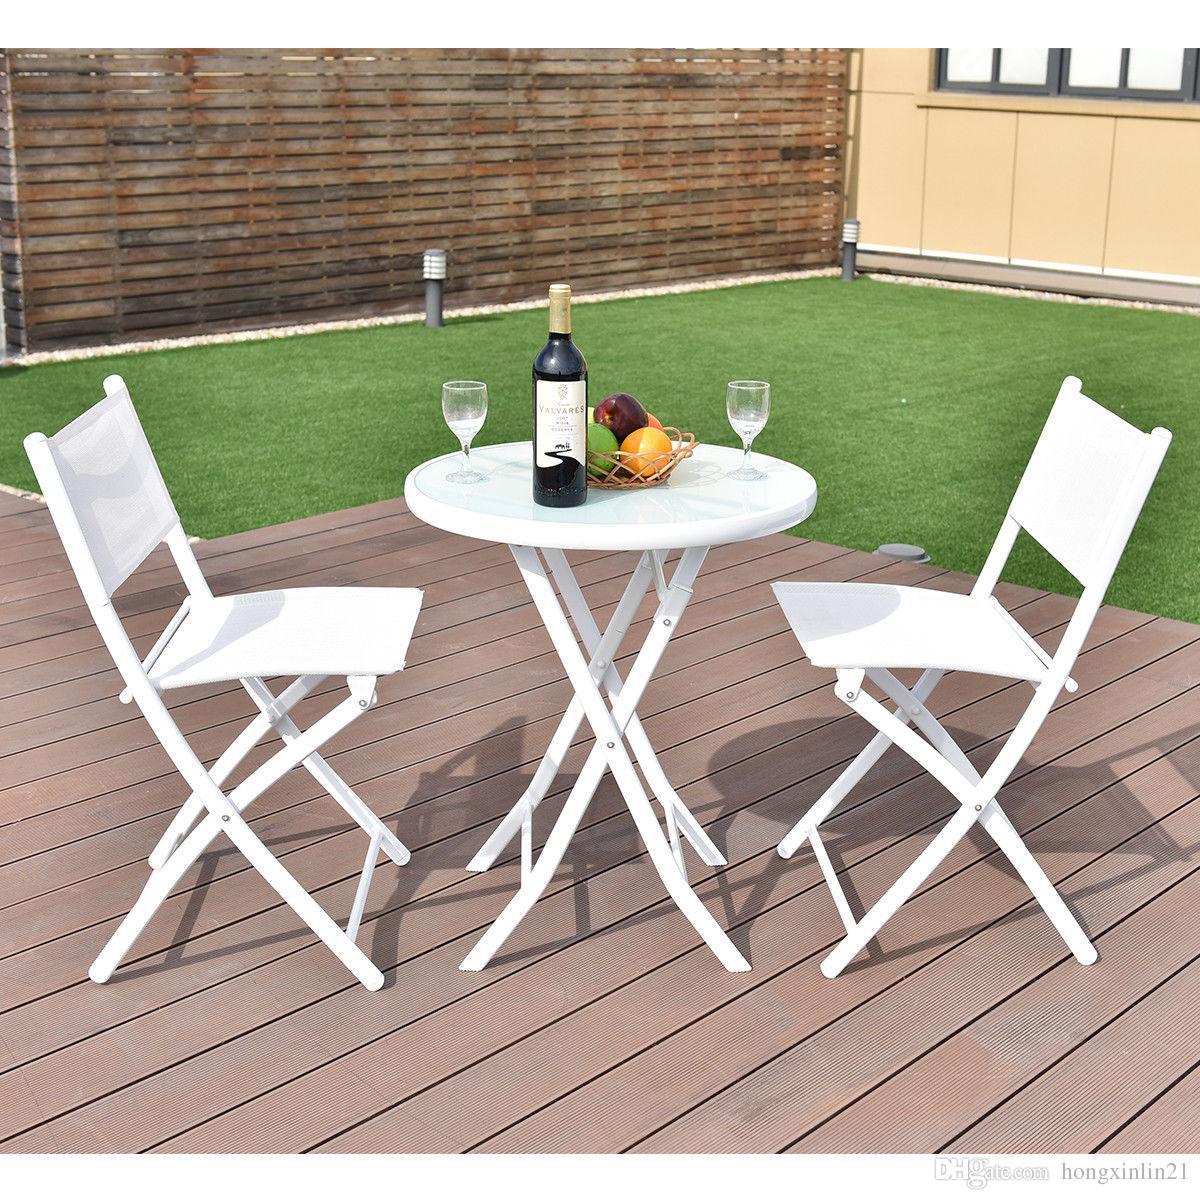 Fabulous 2019 Folding Bistro Table Chairs Set Garden Backyard Patio Furniture White New From Hongxinlin21 71 35 Dhgate Com Bralicious Painted Fabric Chair Ideas Braliciousco